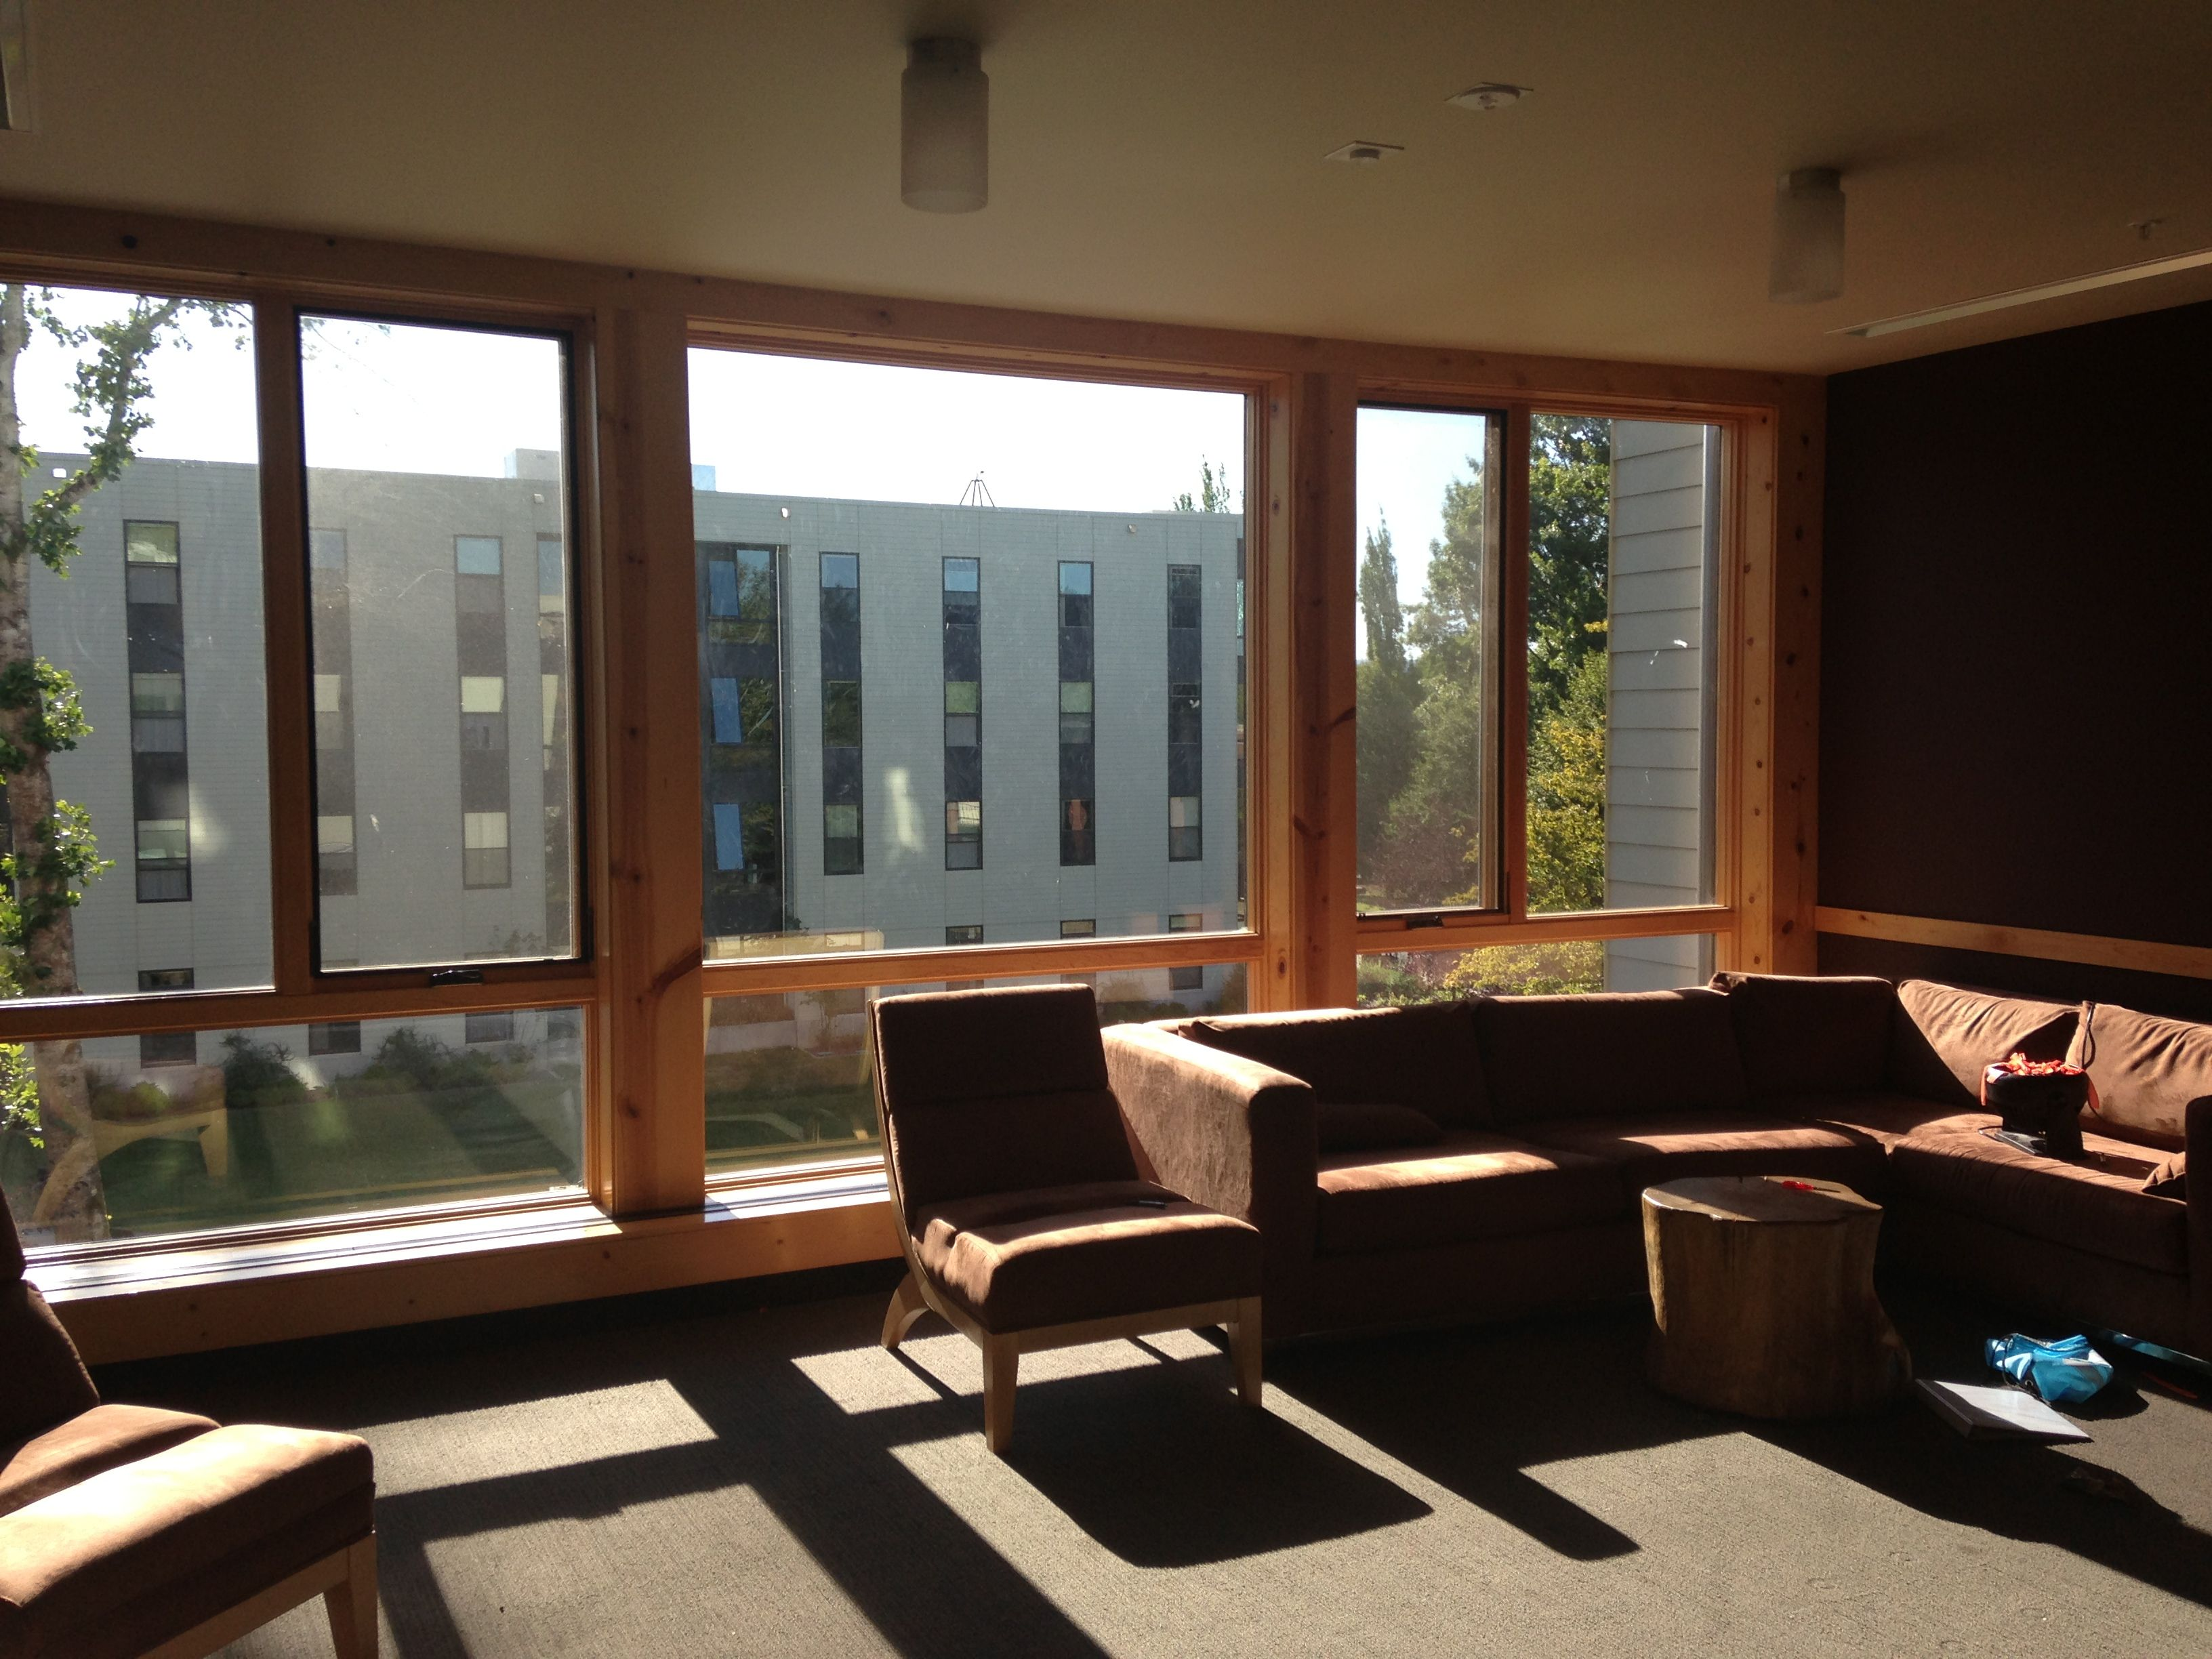 Lounge In A Freshman Dorm At Western Oregon University The School Has 4600 Undergrads